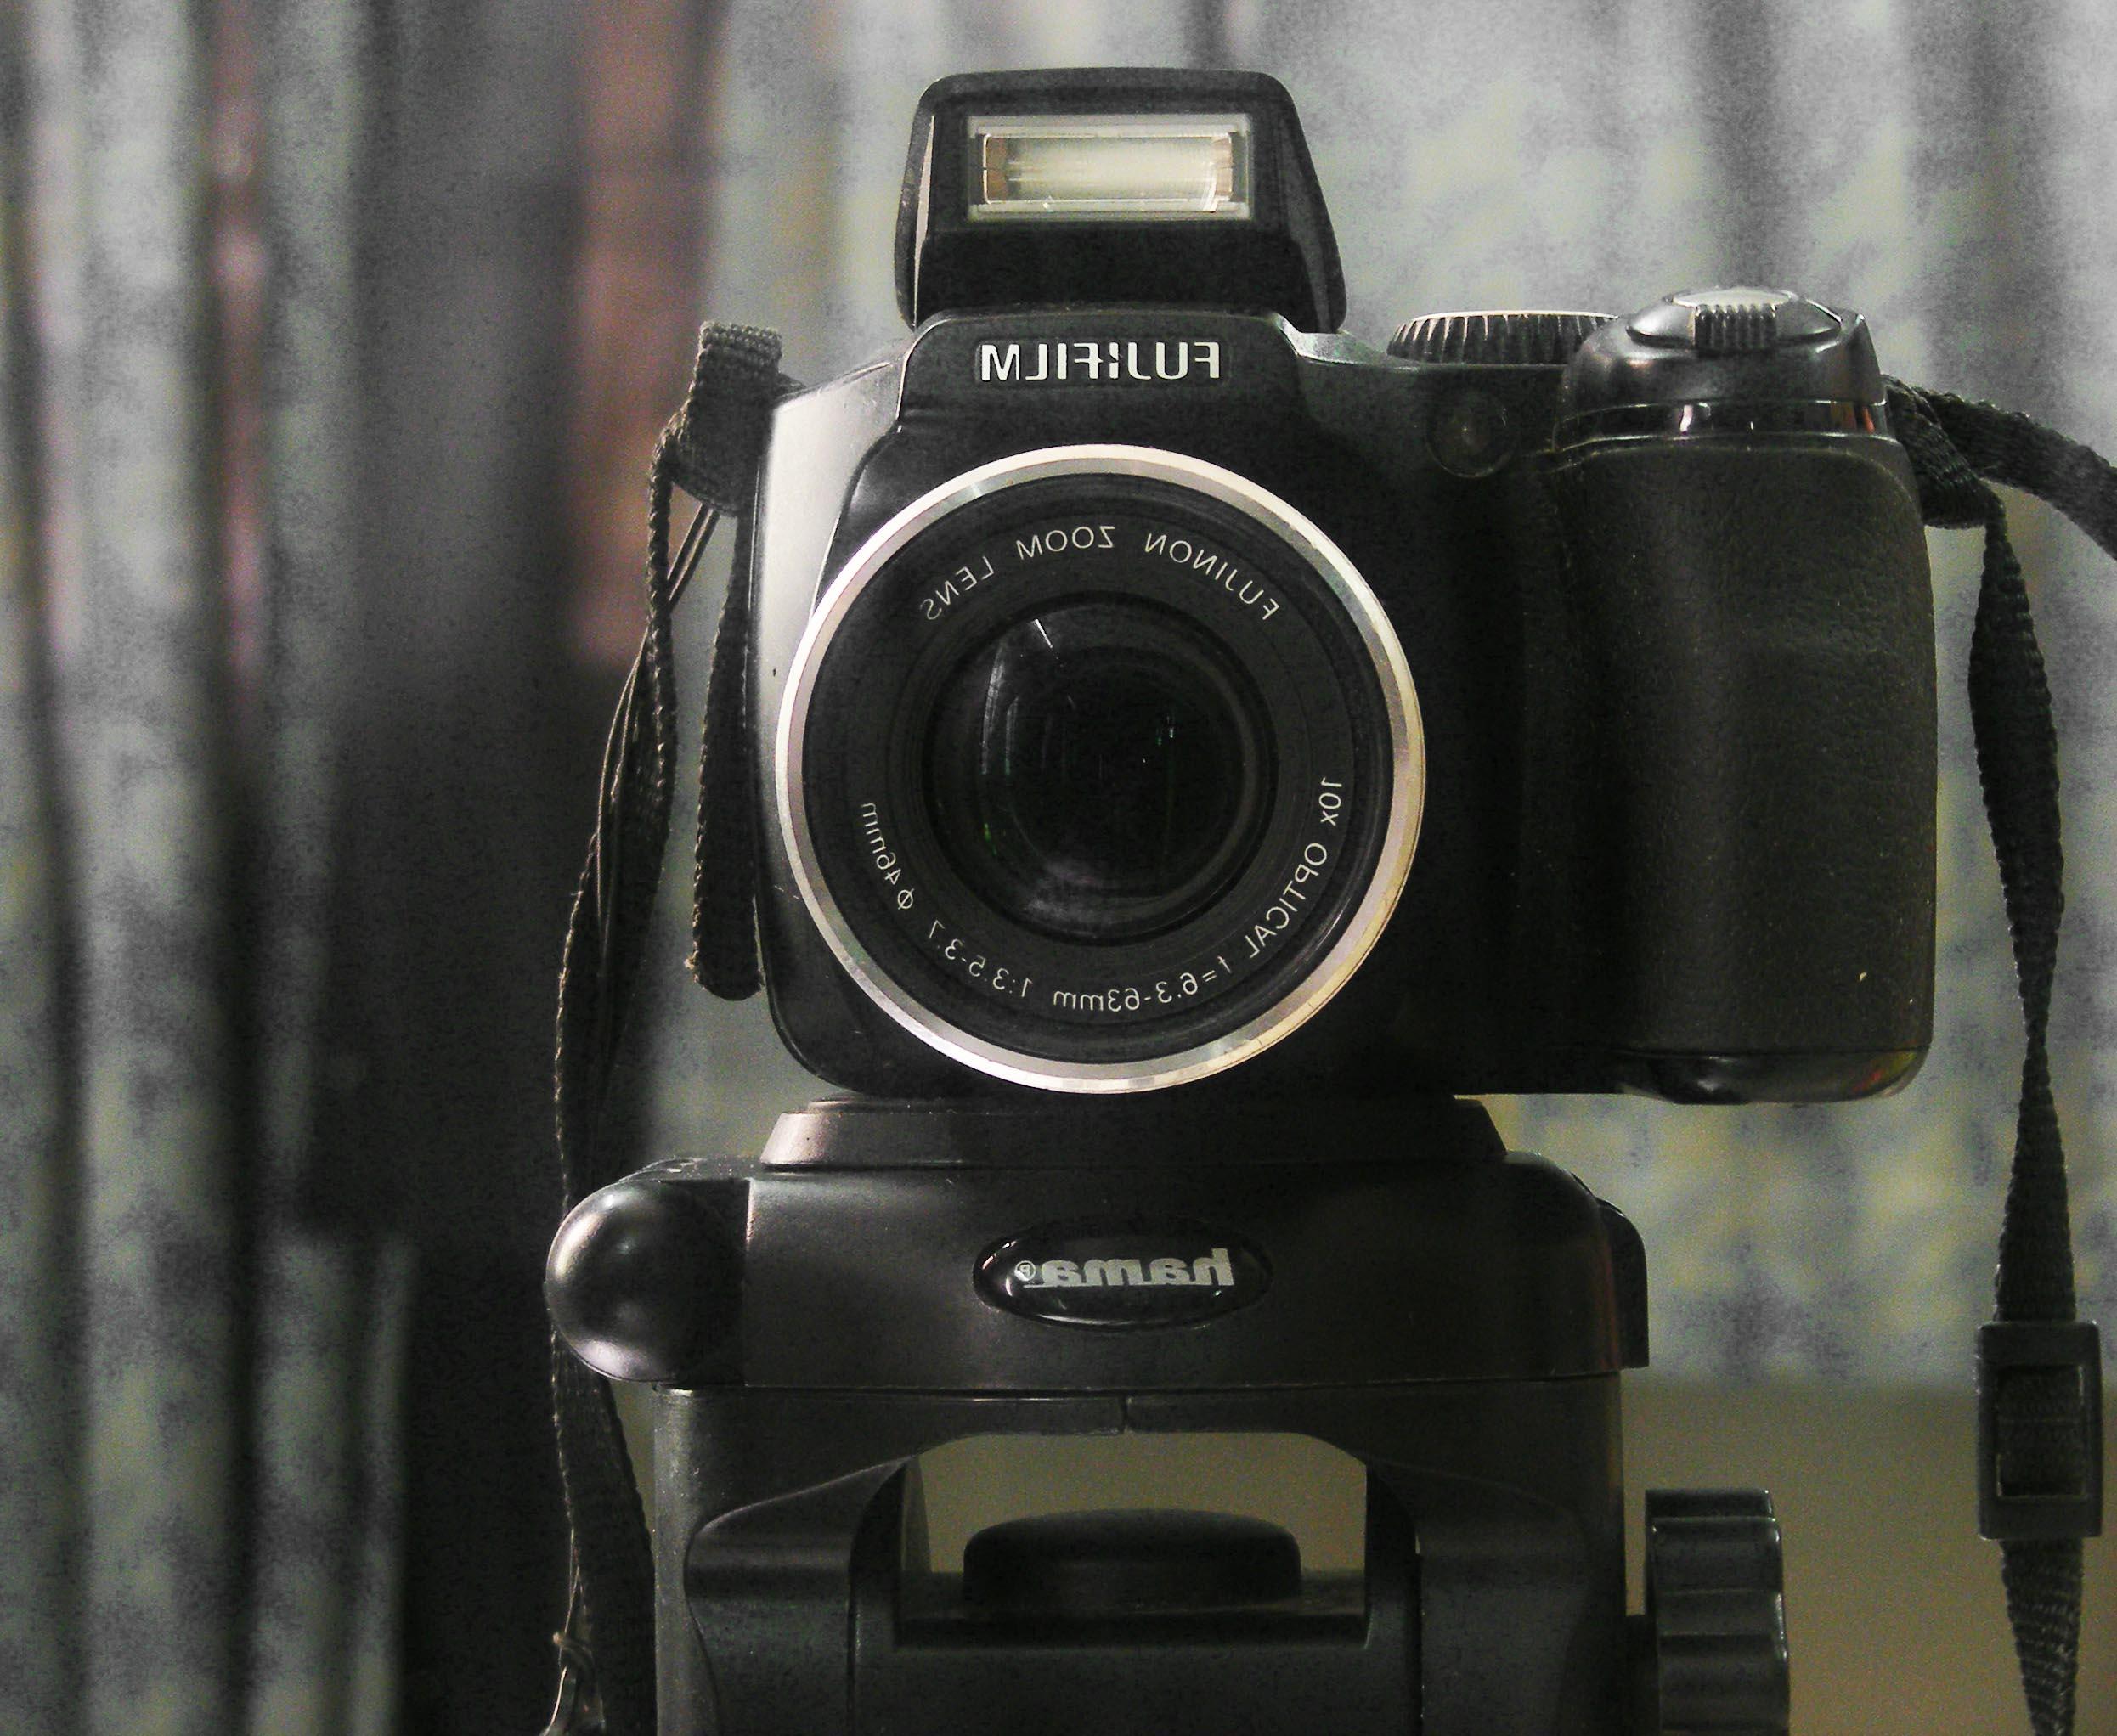 superzoom 8 megapixel digital camera fujifilm finepix s5800 clickbd rh clickbd com fujifilm s5800 manual fujifilm s5000 manual